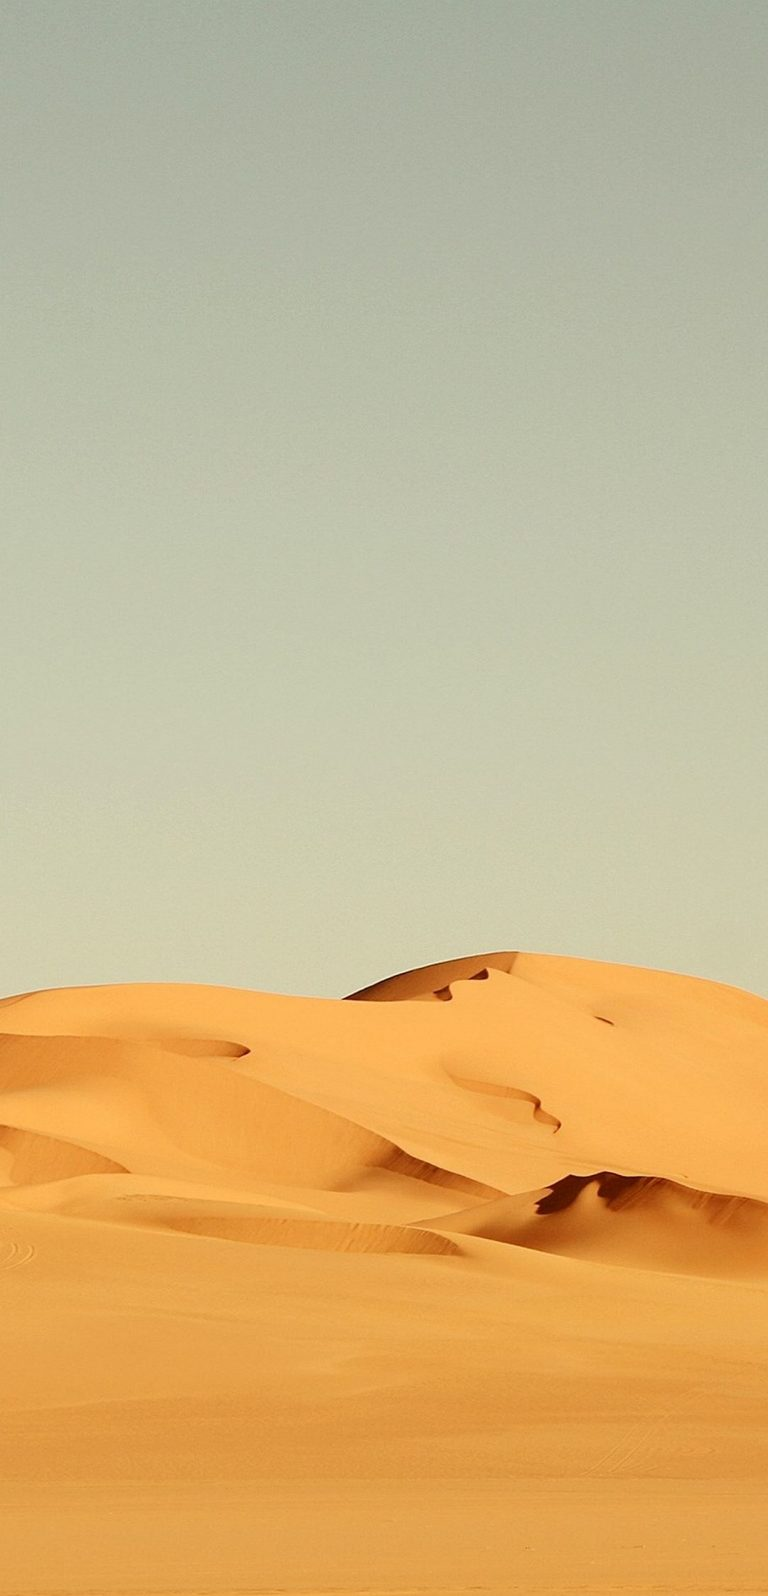 Sahara Desert 1080x2244 768x1596